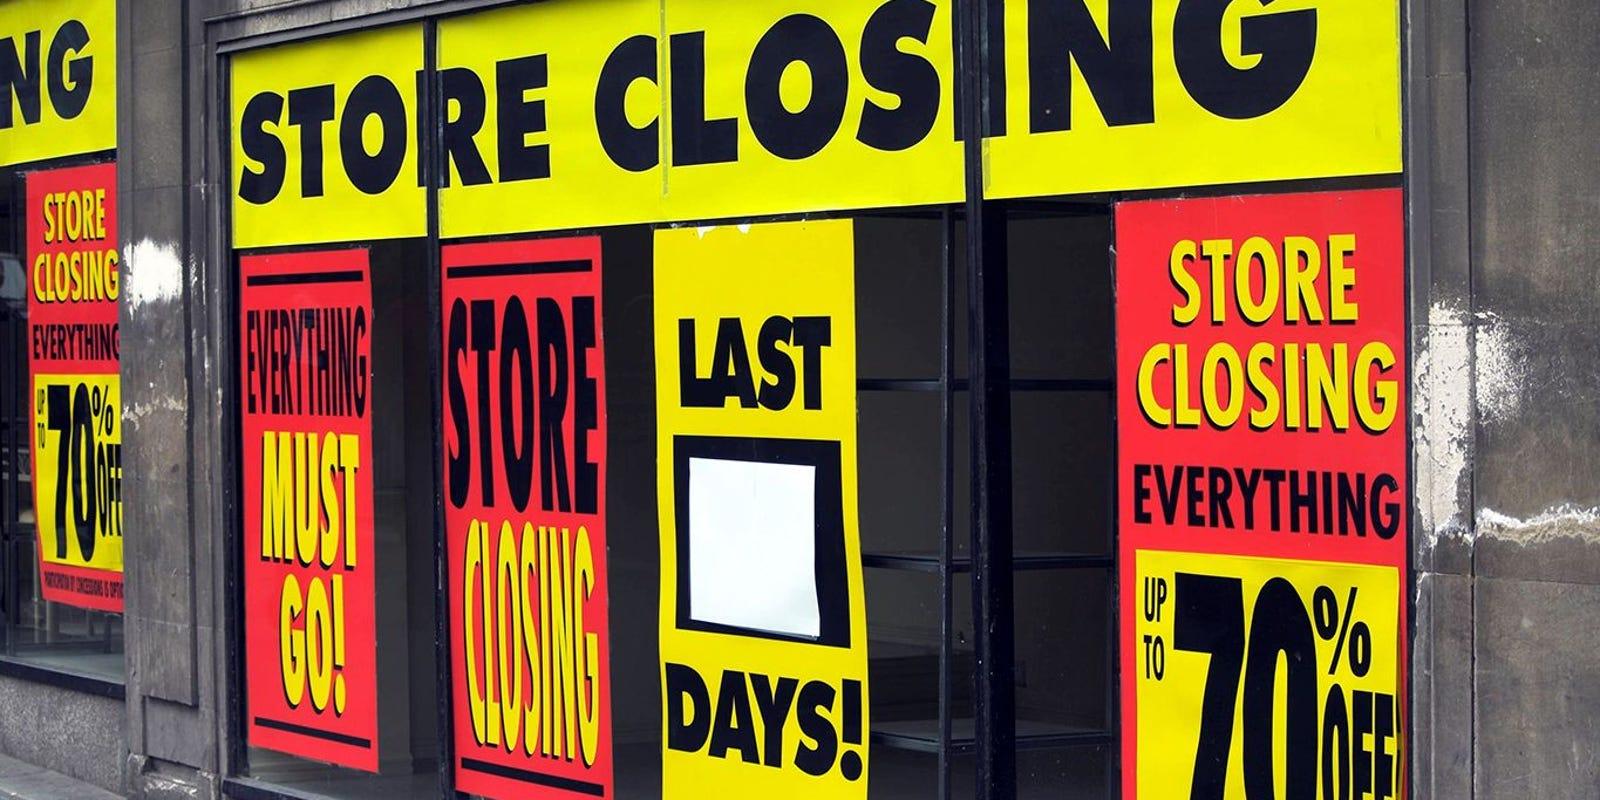 small business loan program facing more delays